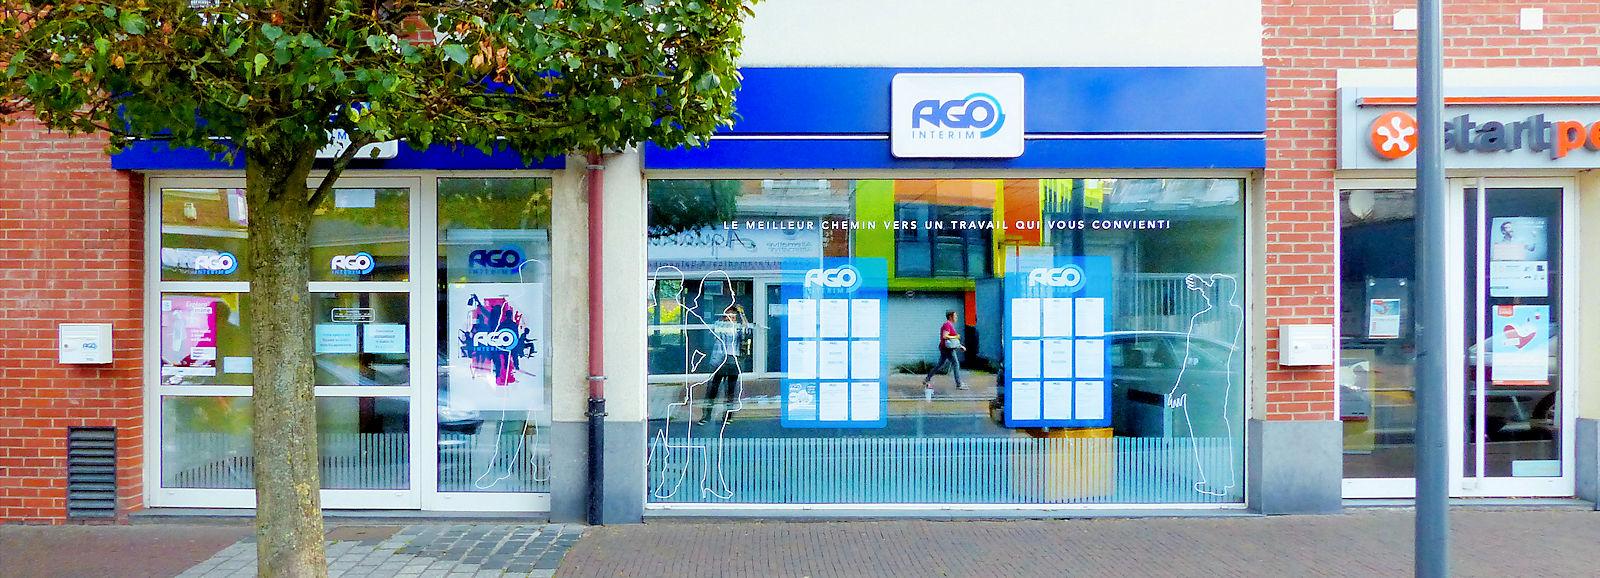 AGO Interim - Tourcoing Centre